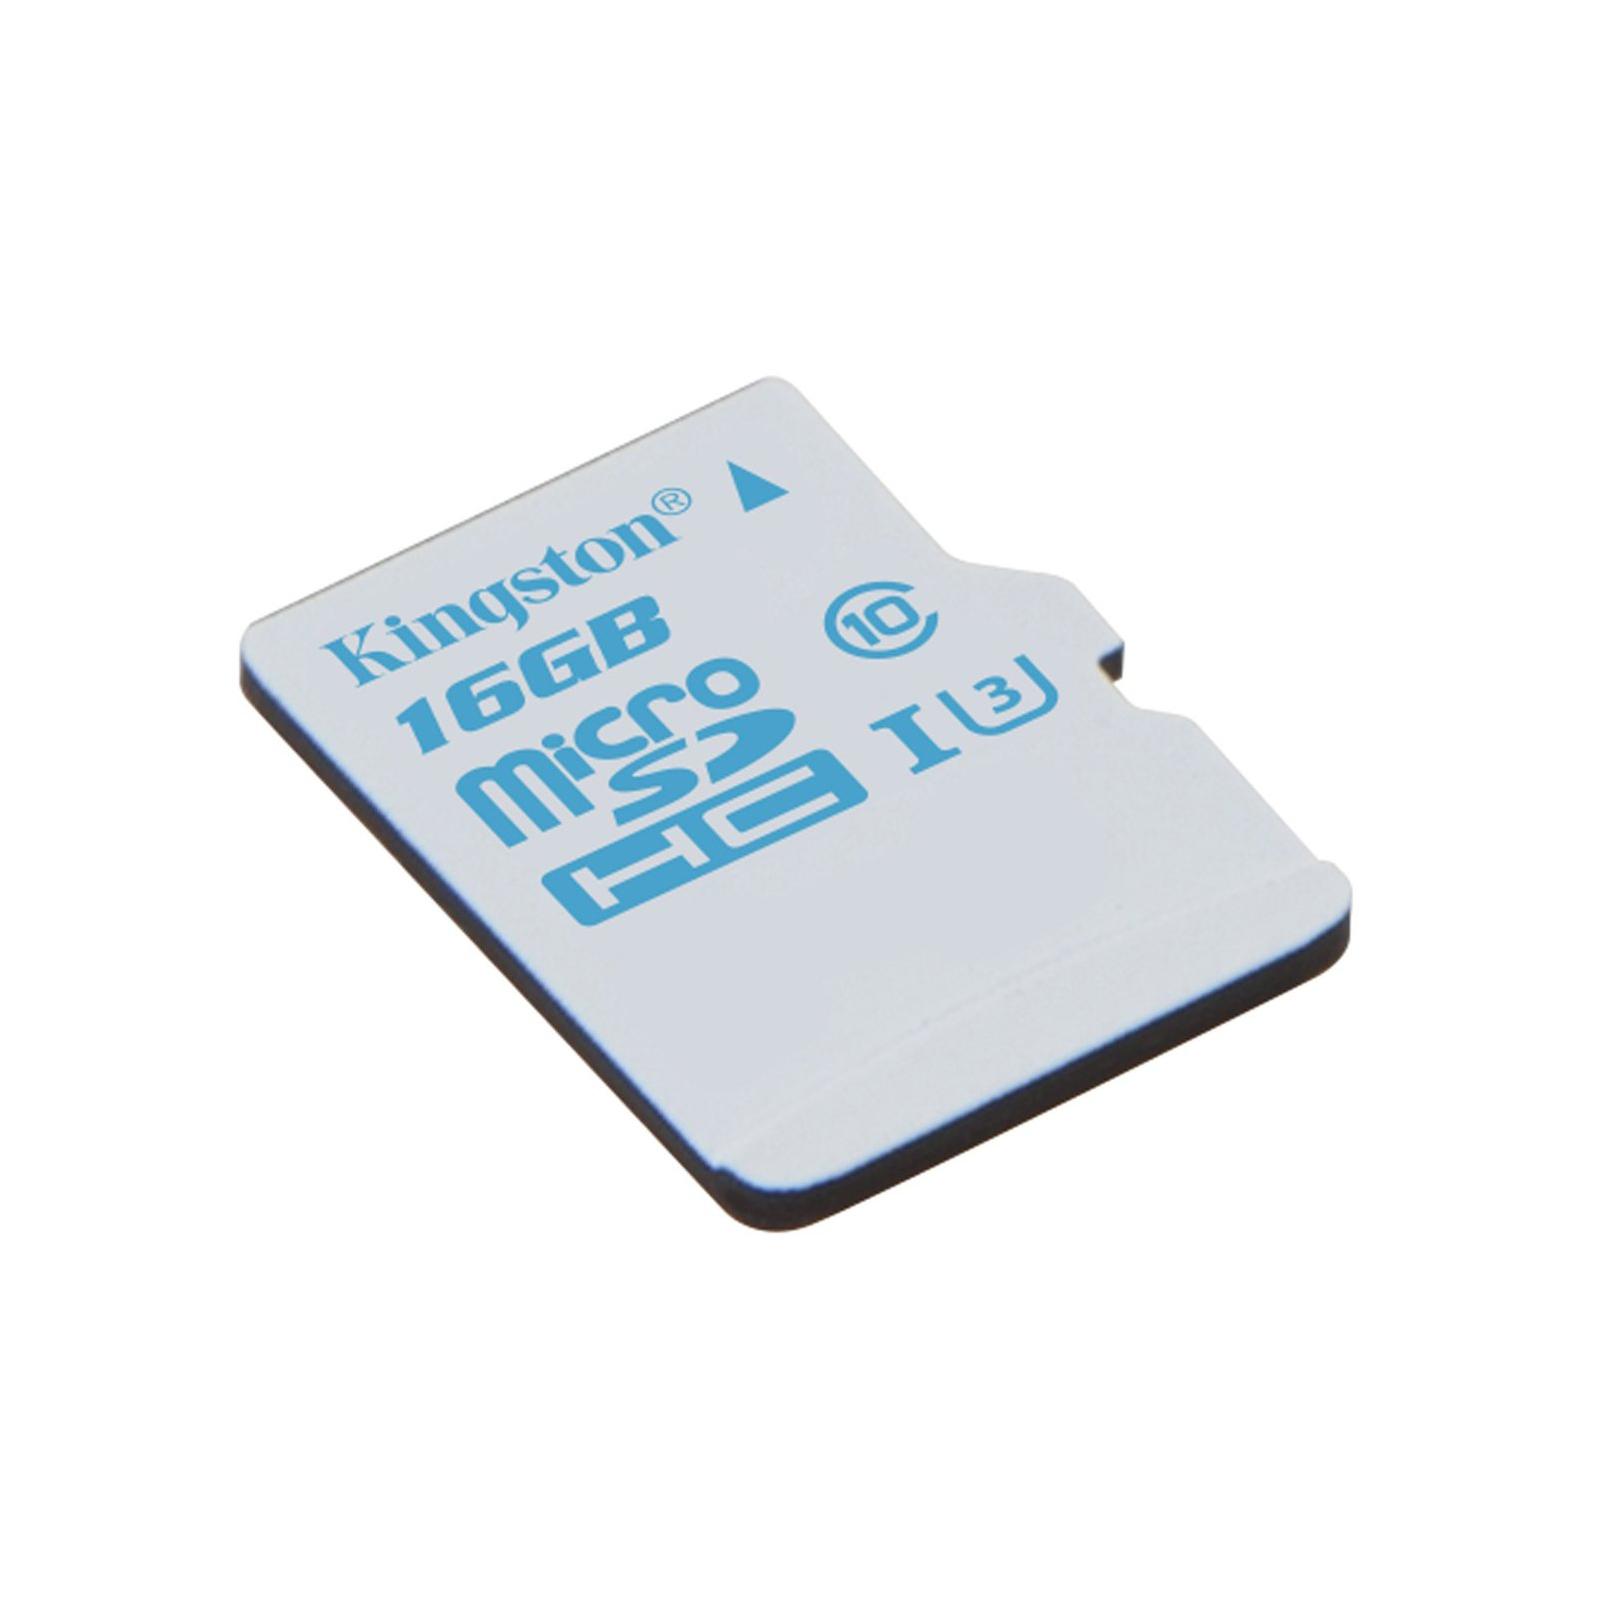 Карта памяти Kingston 16GB microSDHC class 10 UHS-I U3 (SDCAC/16GBSP) изображение 2